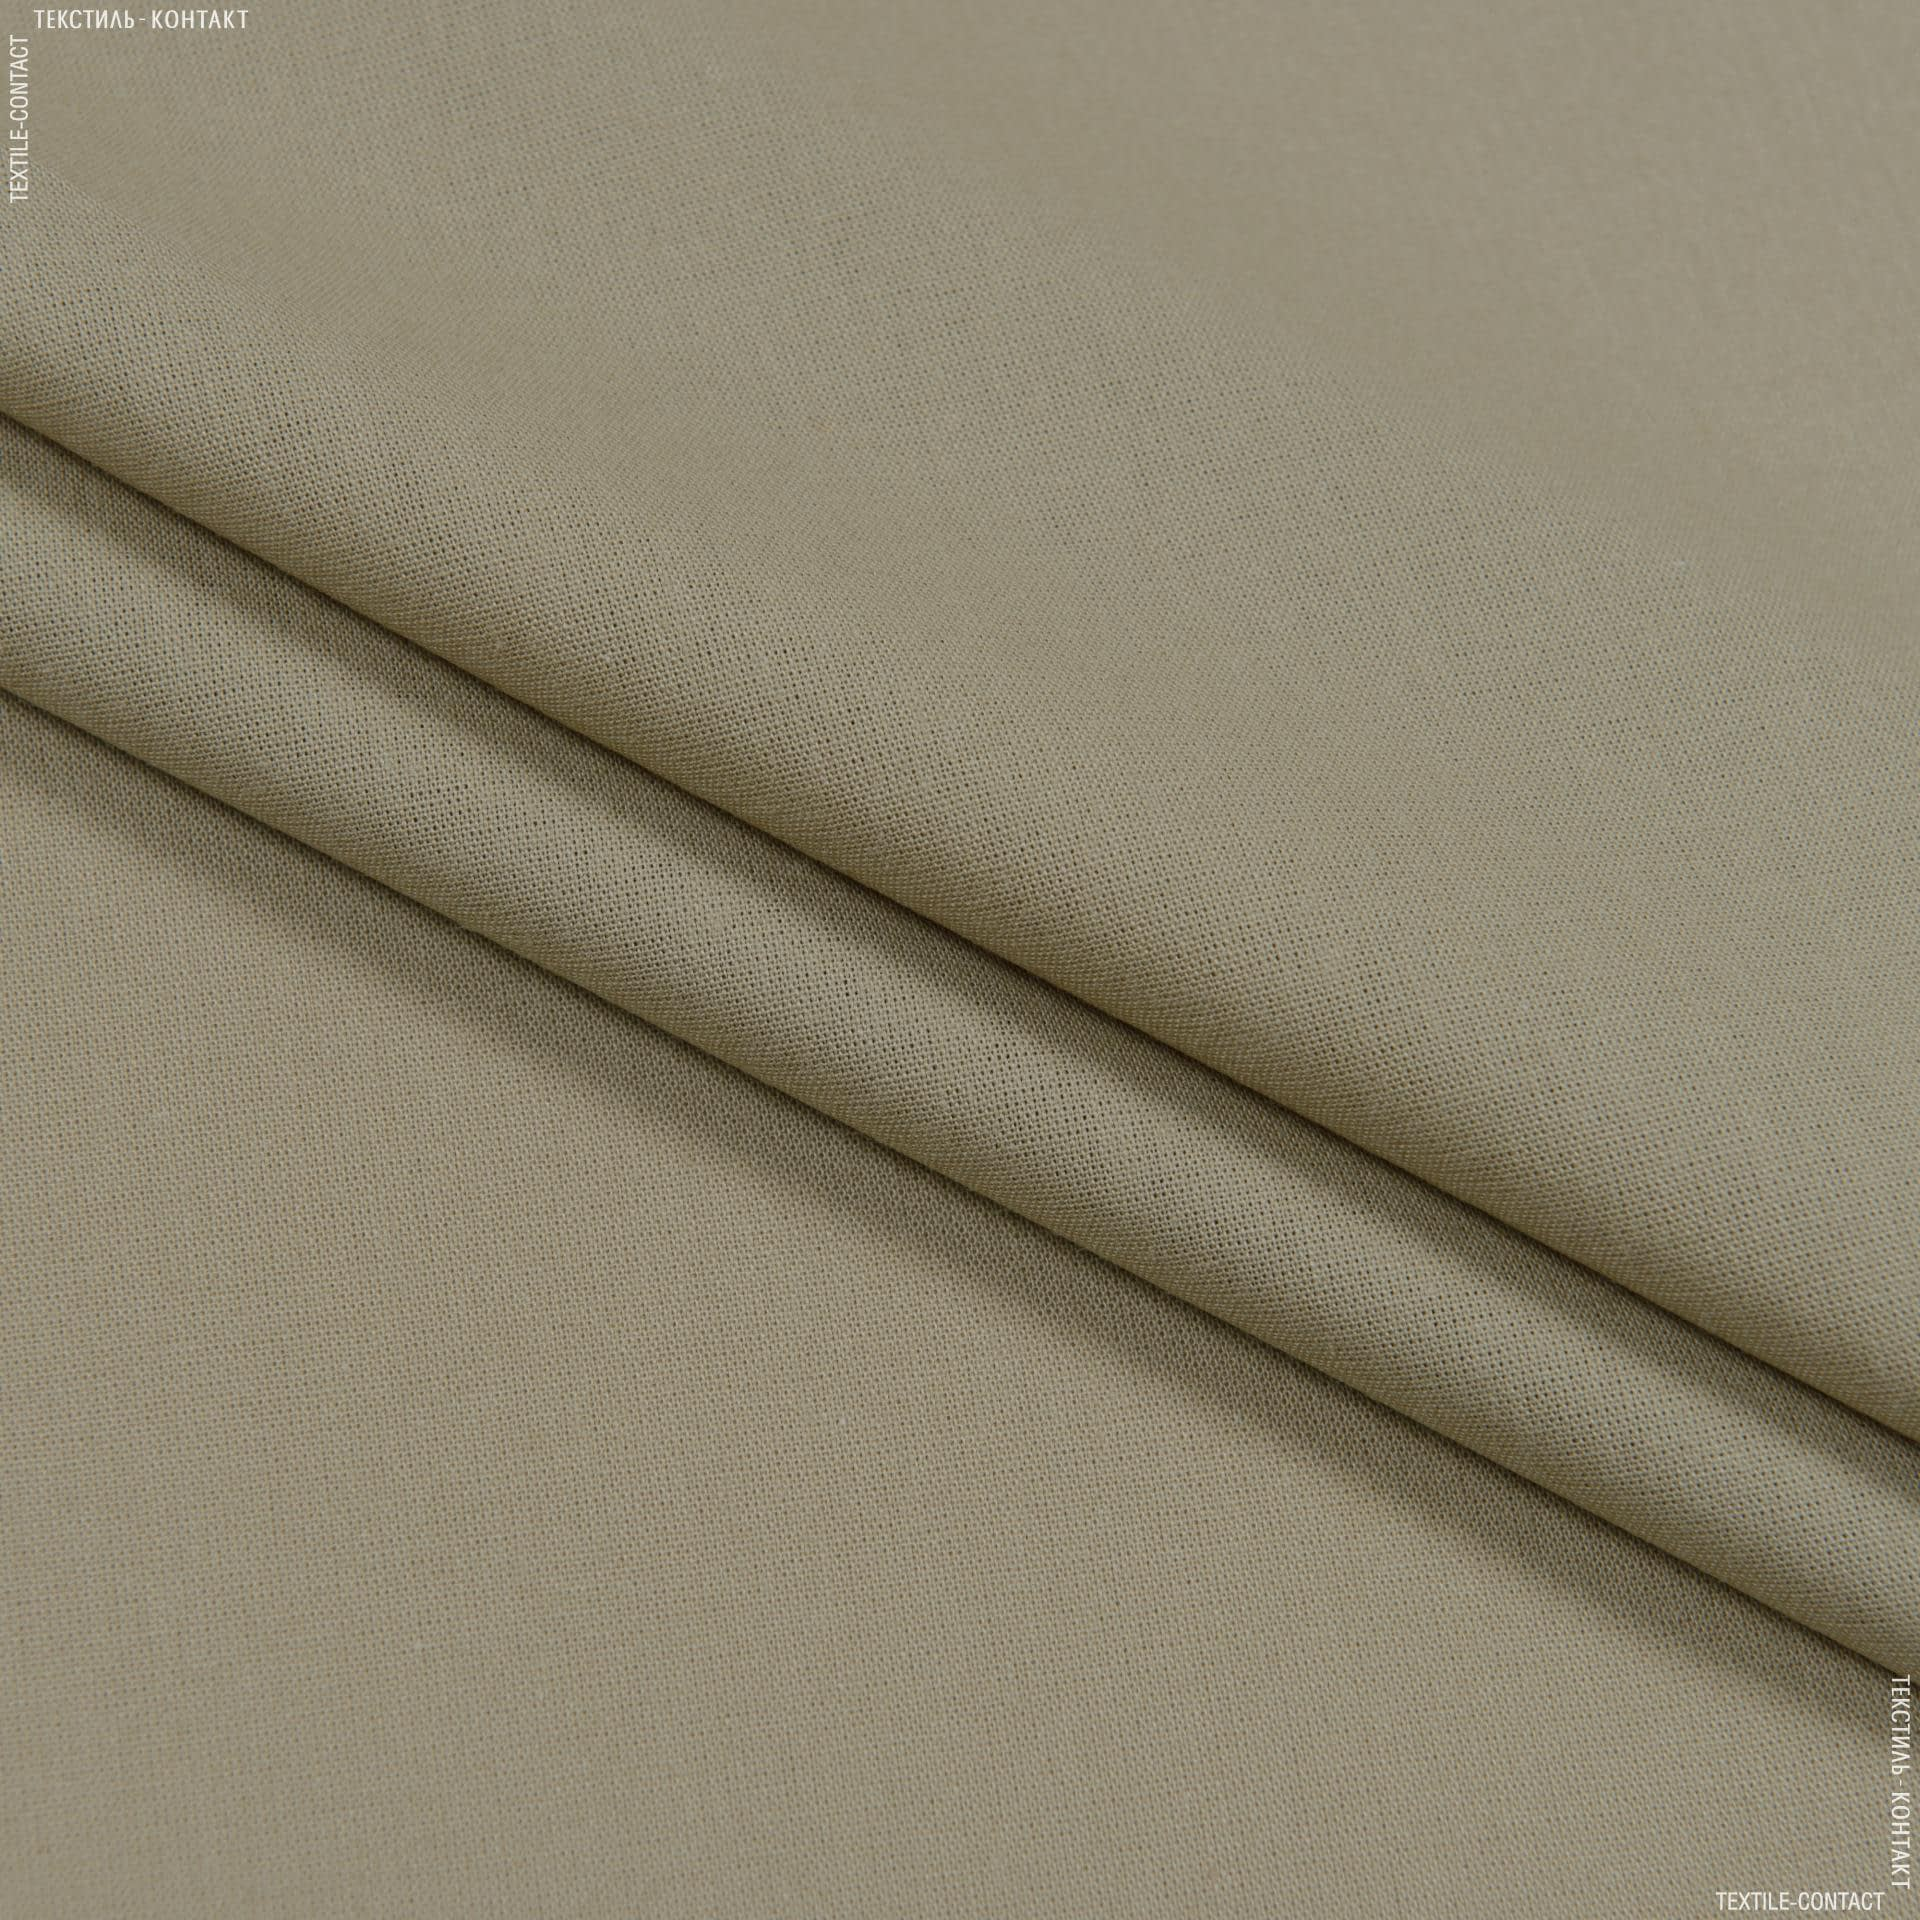 Ткани подкладочная ткань - Бязь гладкокрашеная бежевый